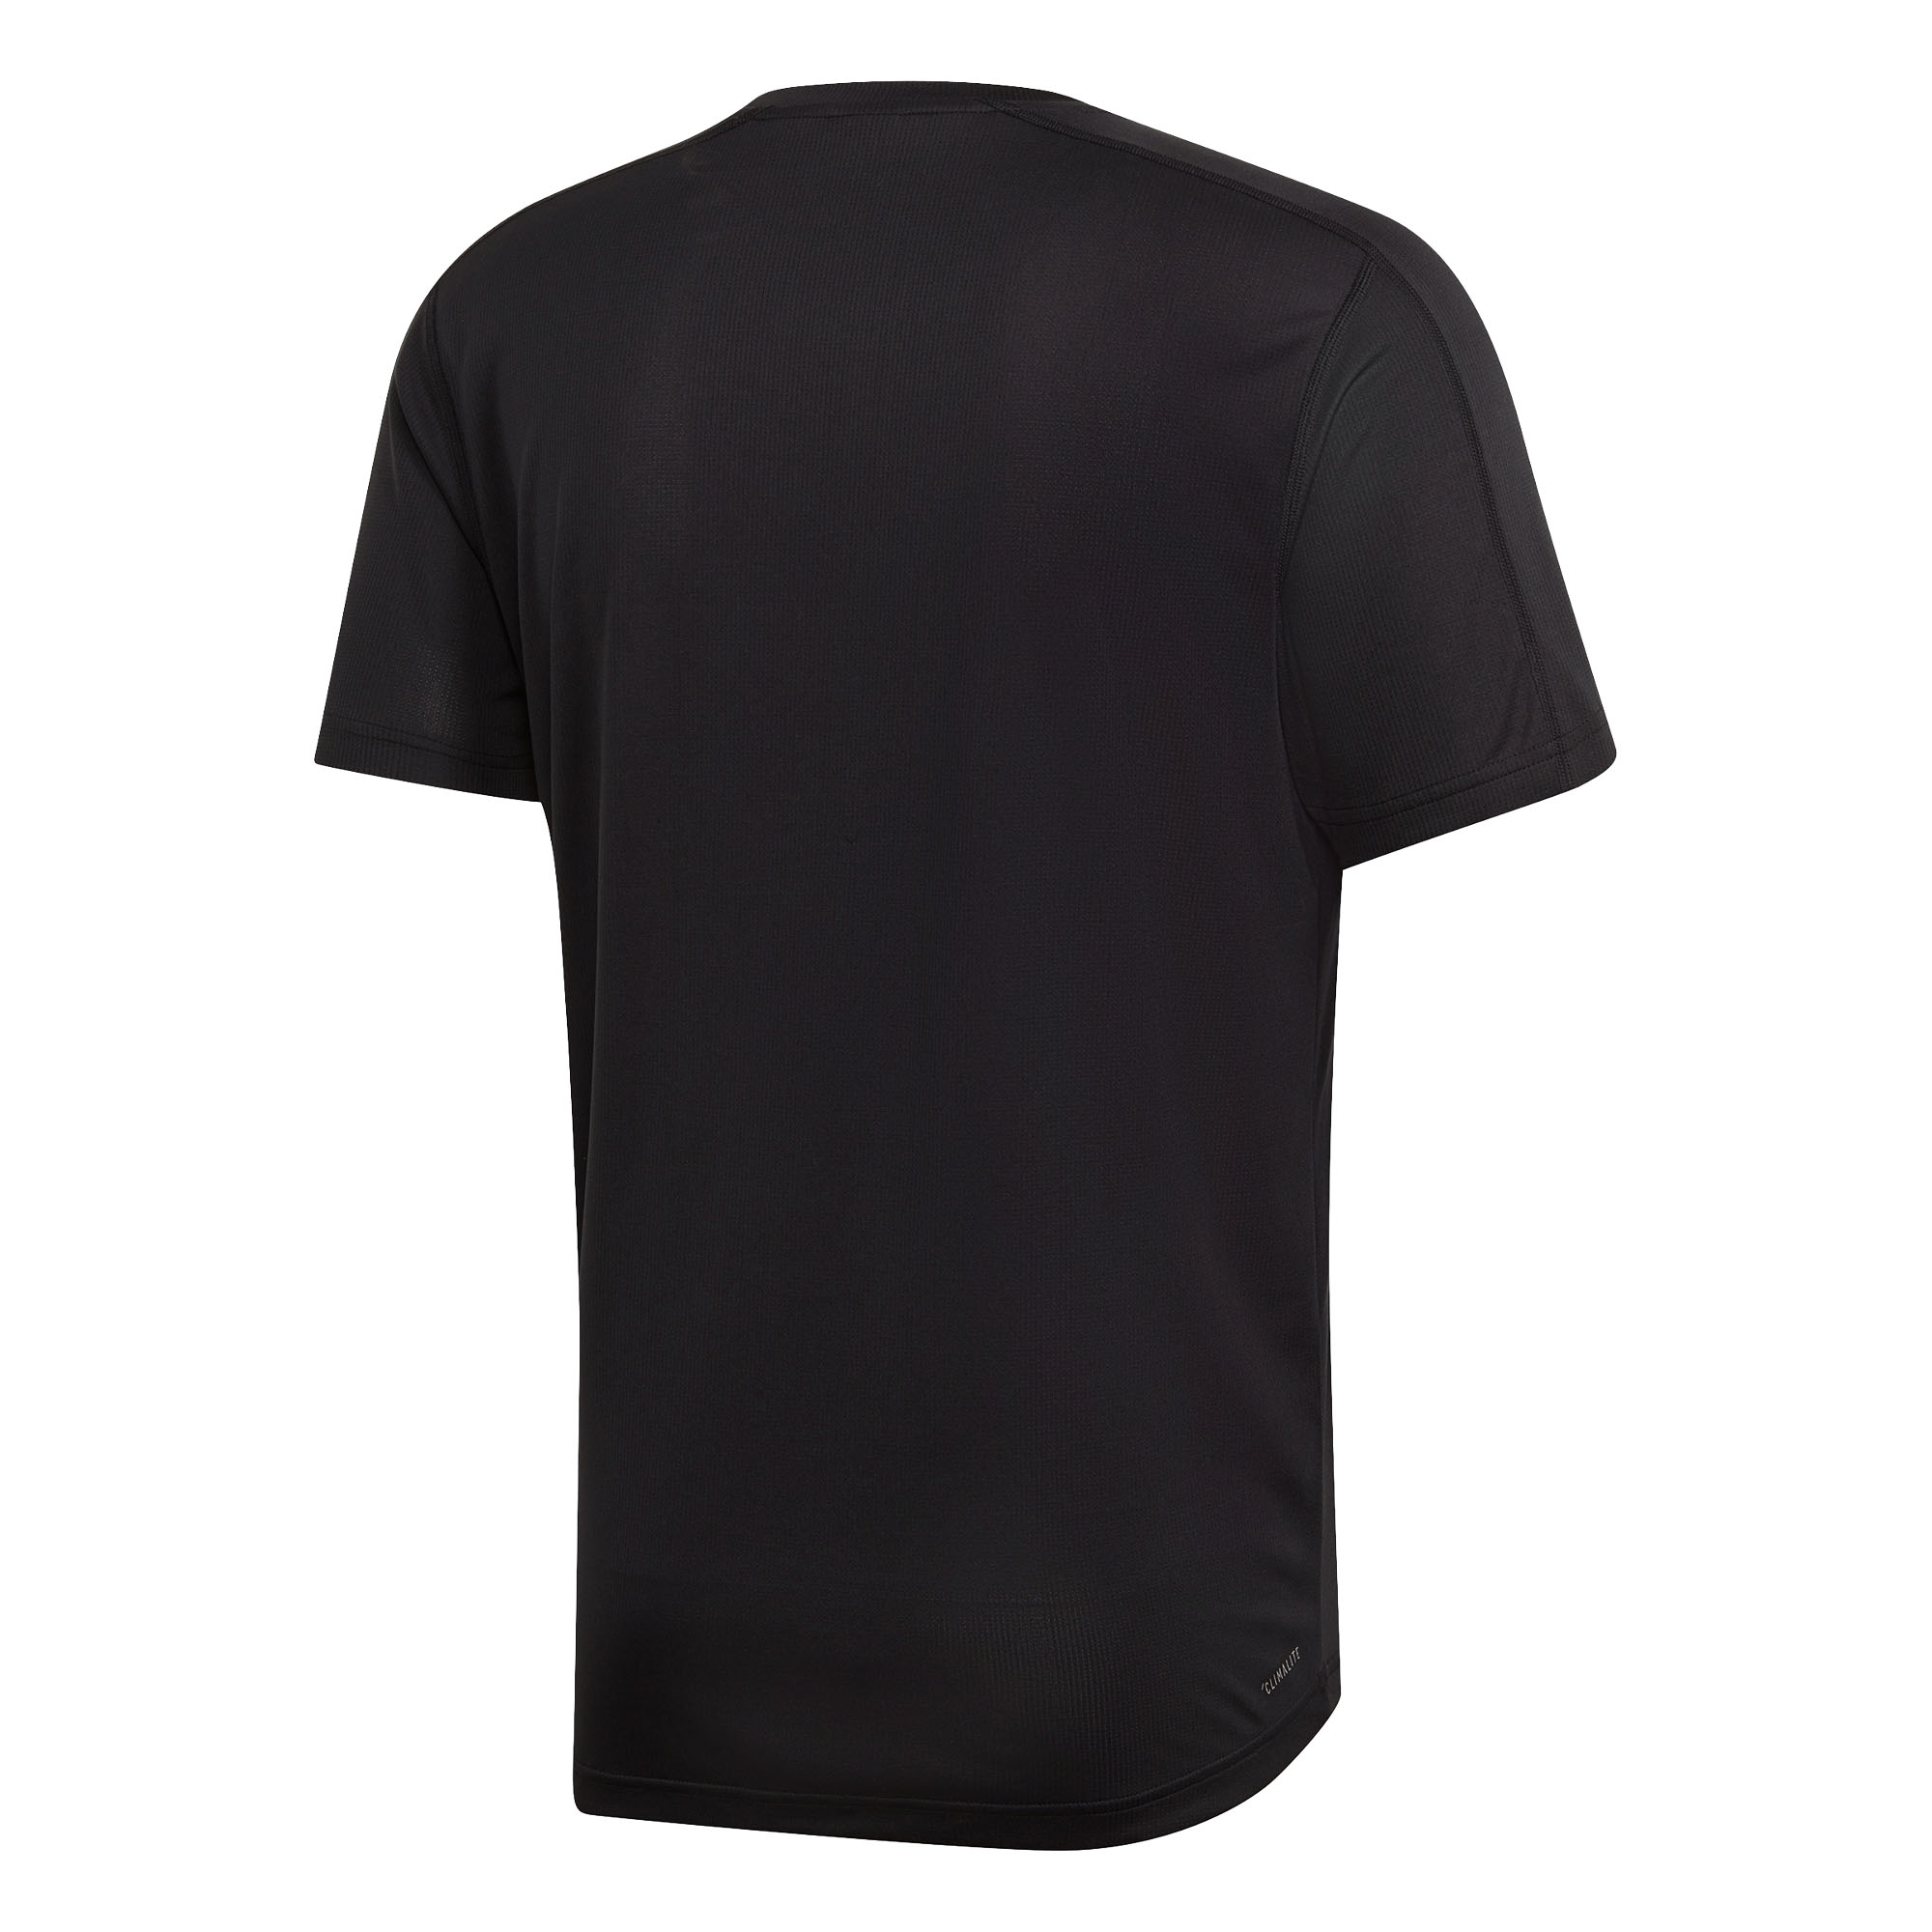 Adidas freelift Chill 1 Homme Fitness Exercice Entraînement Gym T-shirt Tee Noir